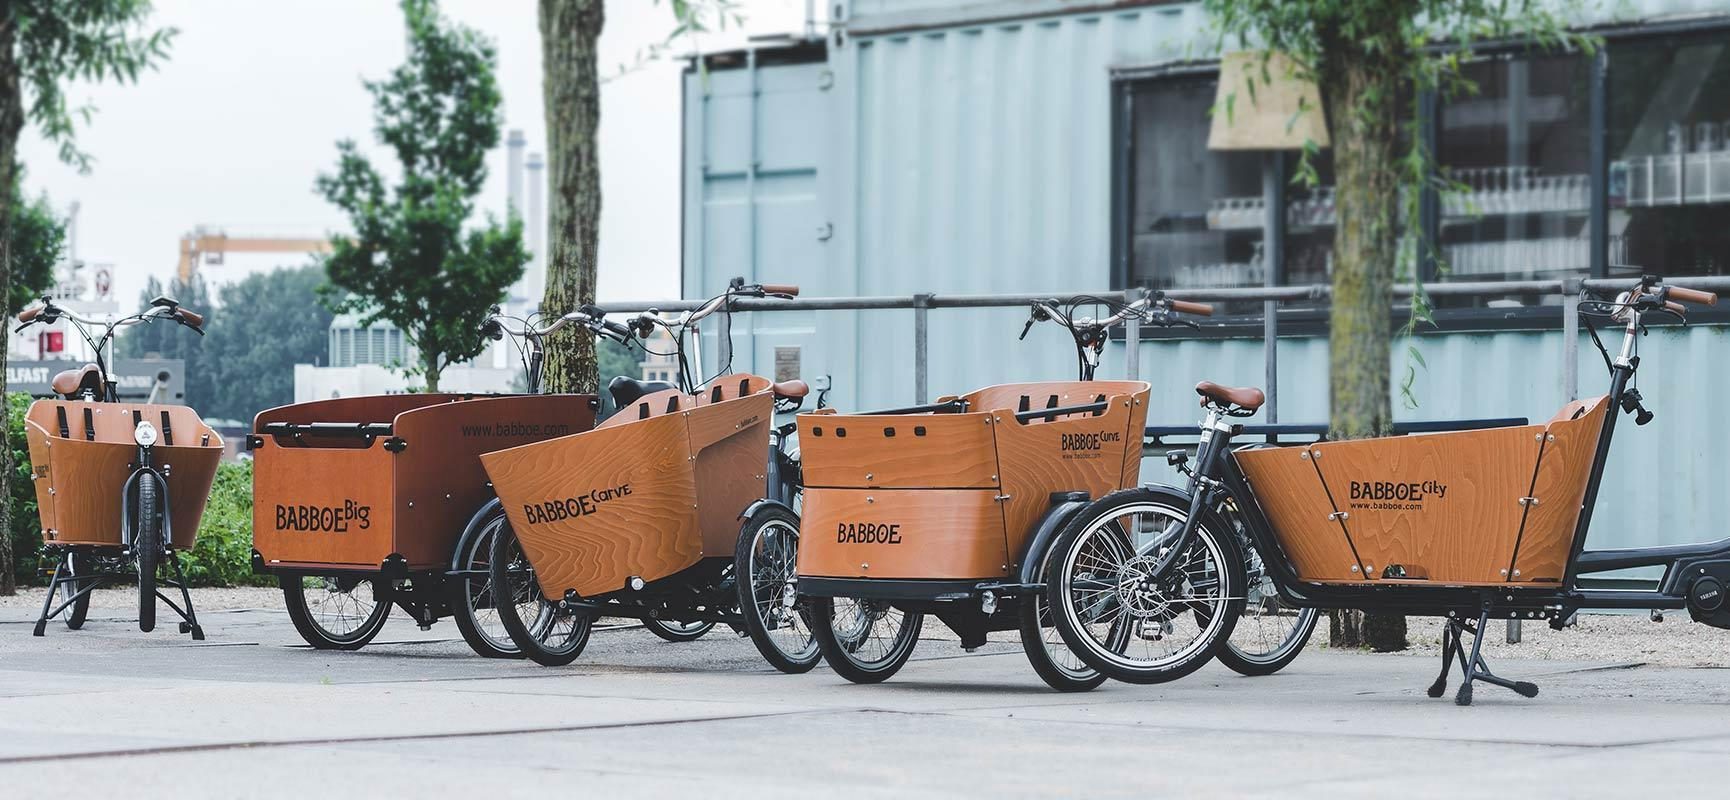 Weight of a cargo bike